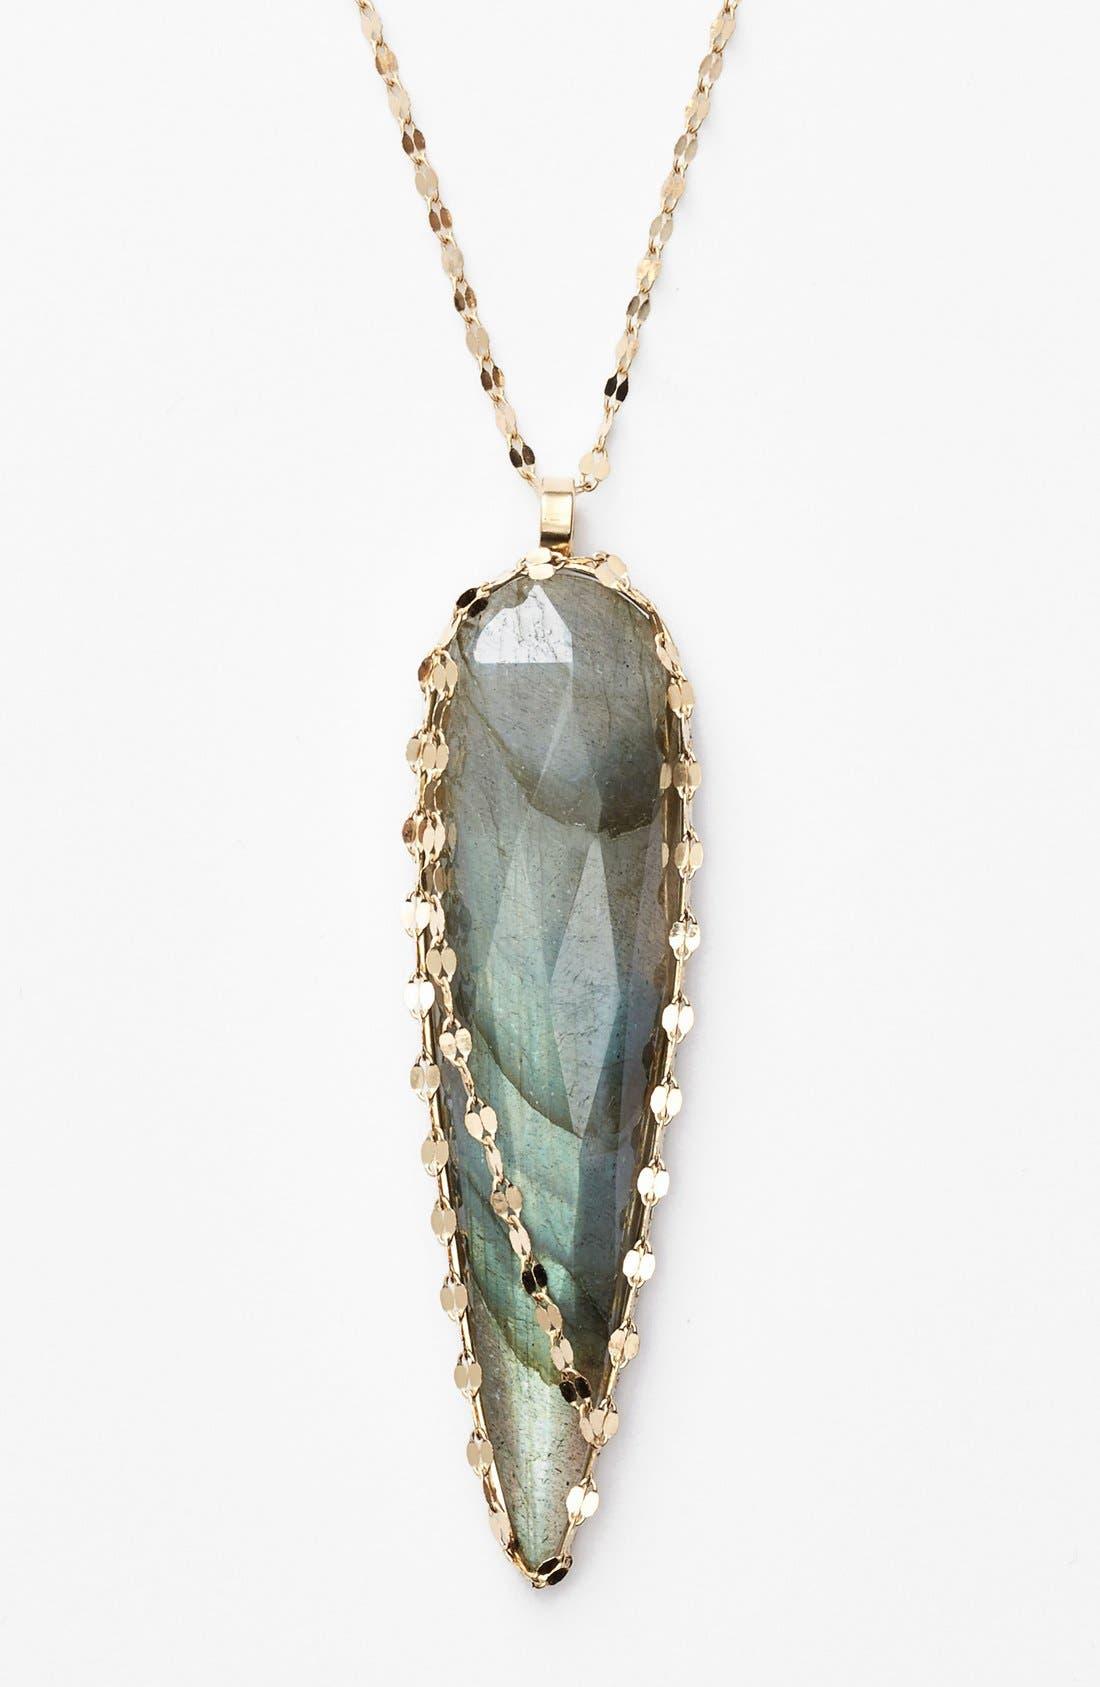 Main Image - Lana Jewelry 'Ultra' Labradorite Spike Pendant Necklace